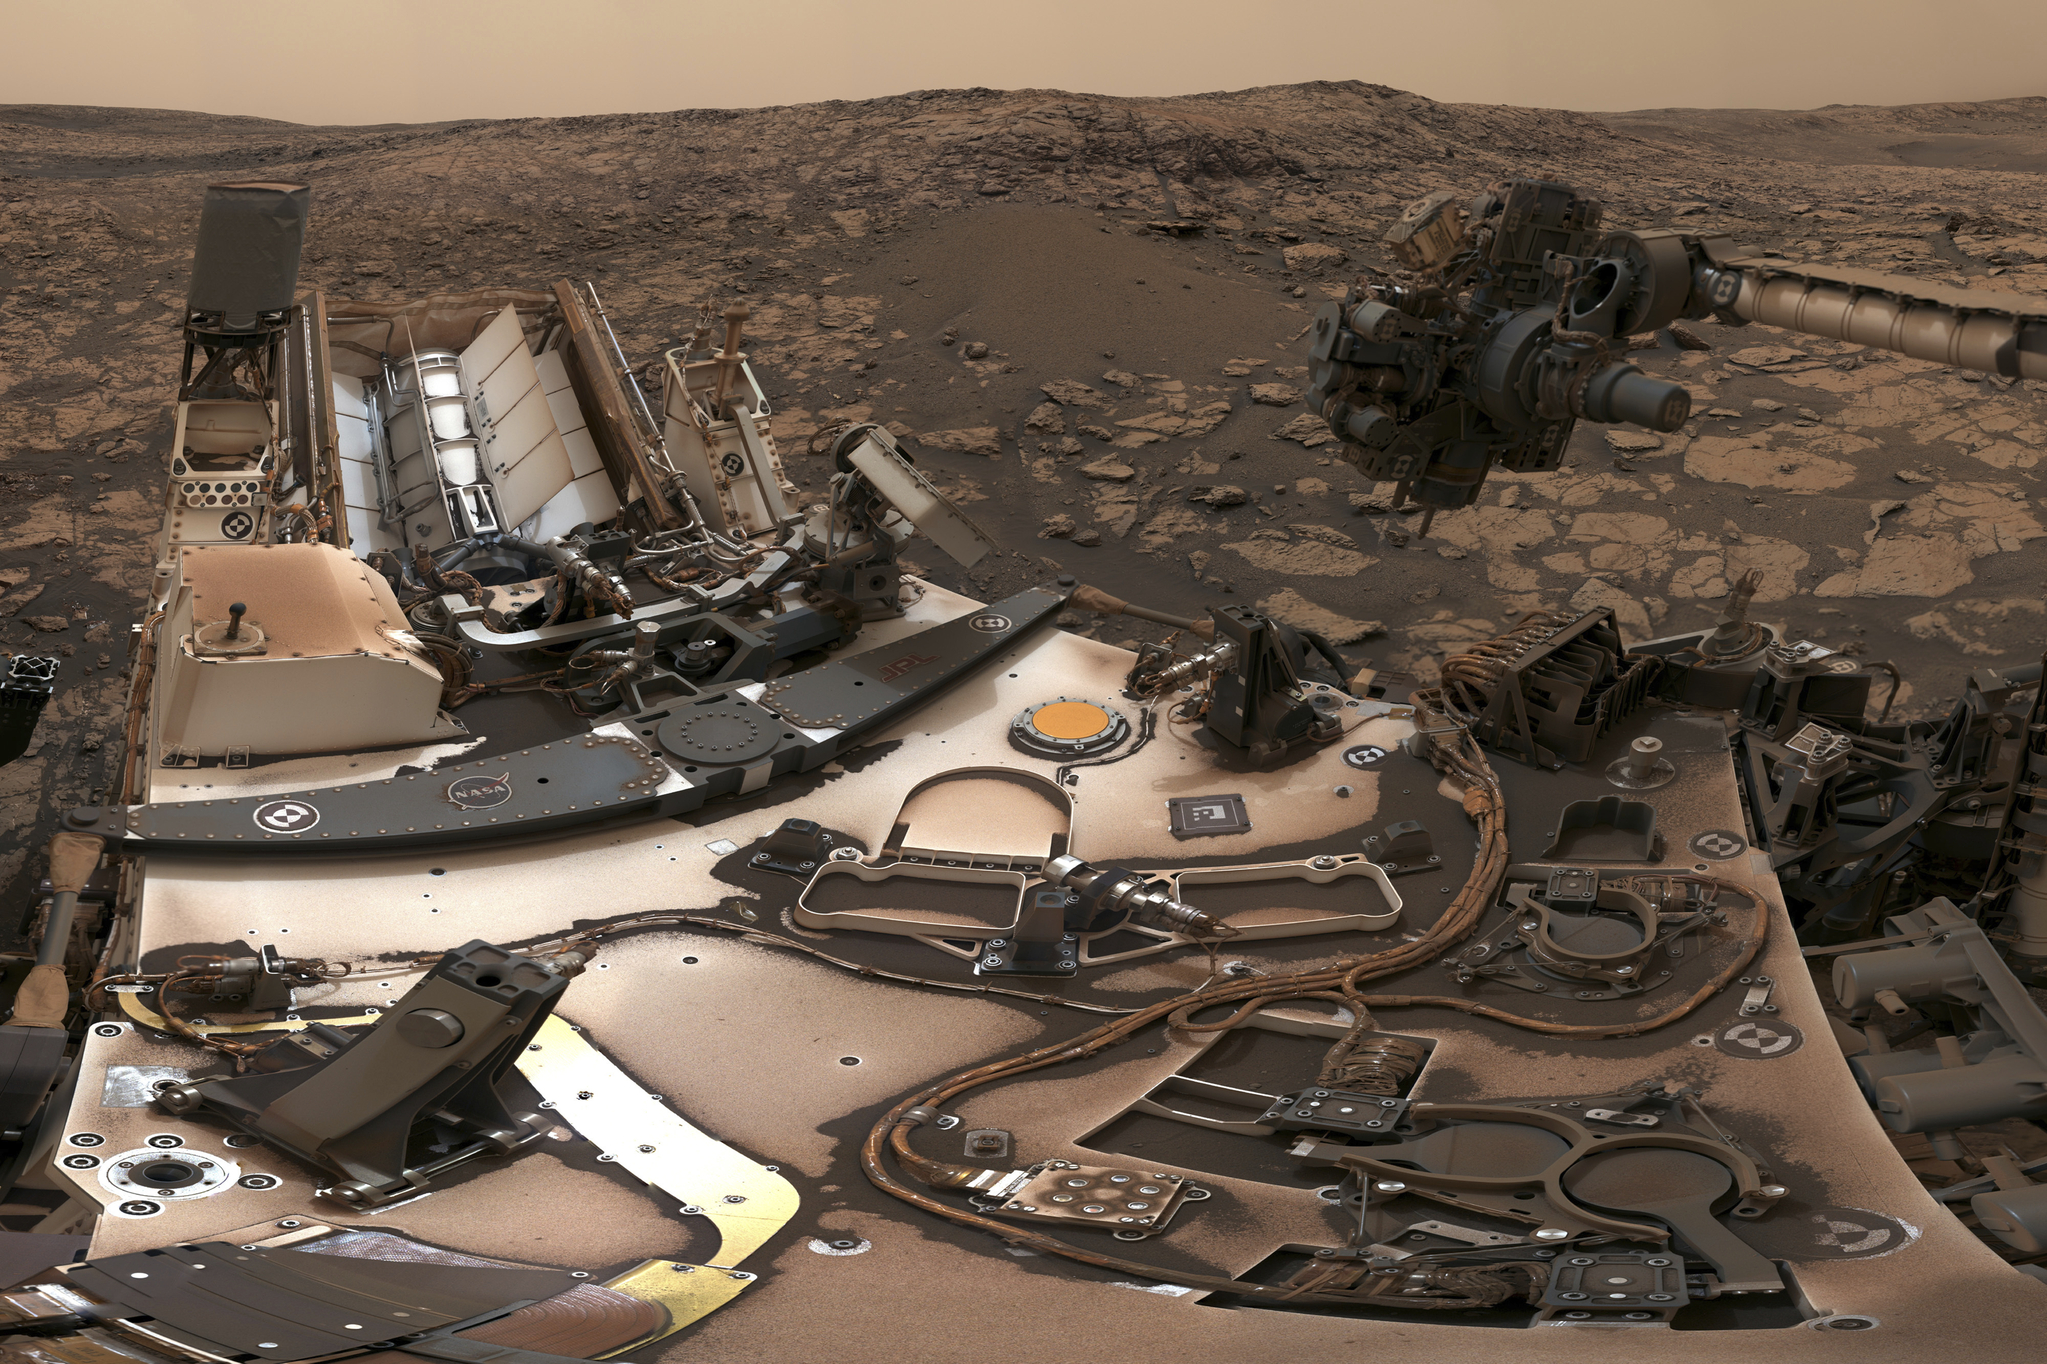 NASA는 지난 8월 9일 화성 탐사선 '큐리오시티'가 촬영해 지구로 전송한 사진을 7일 공개했다. 이번 여름 화성에 몰아쳤던 폭풍 영향으로 탐사선 위로 뿌연 먼지들이 쌓여 있다.[사진 NASA]